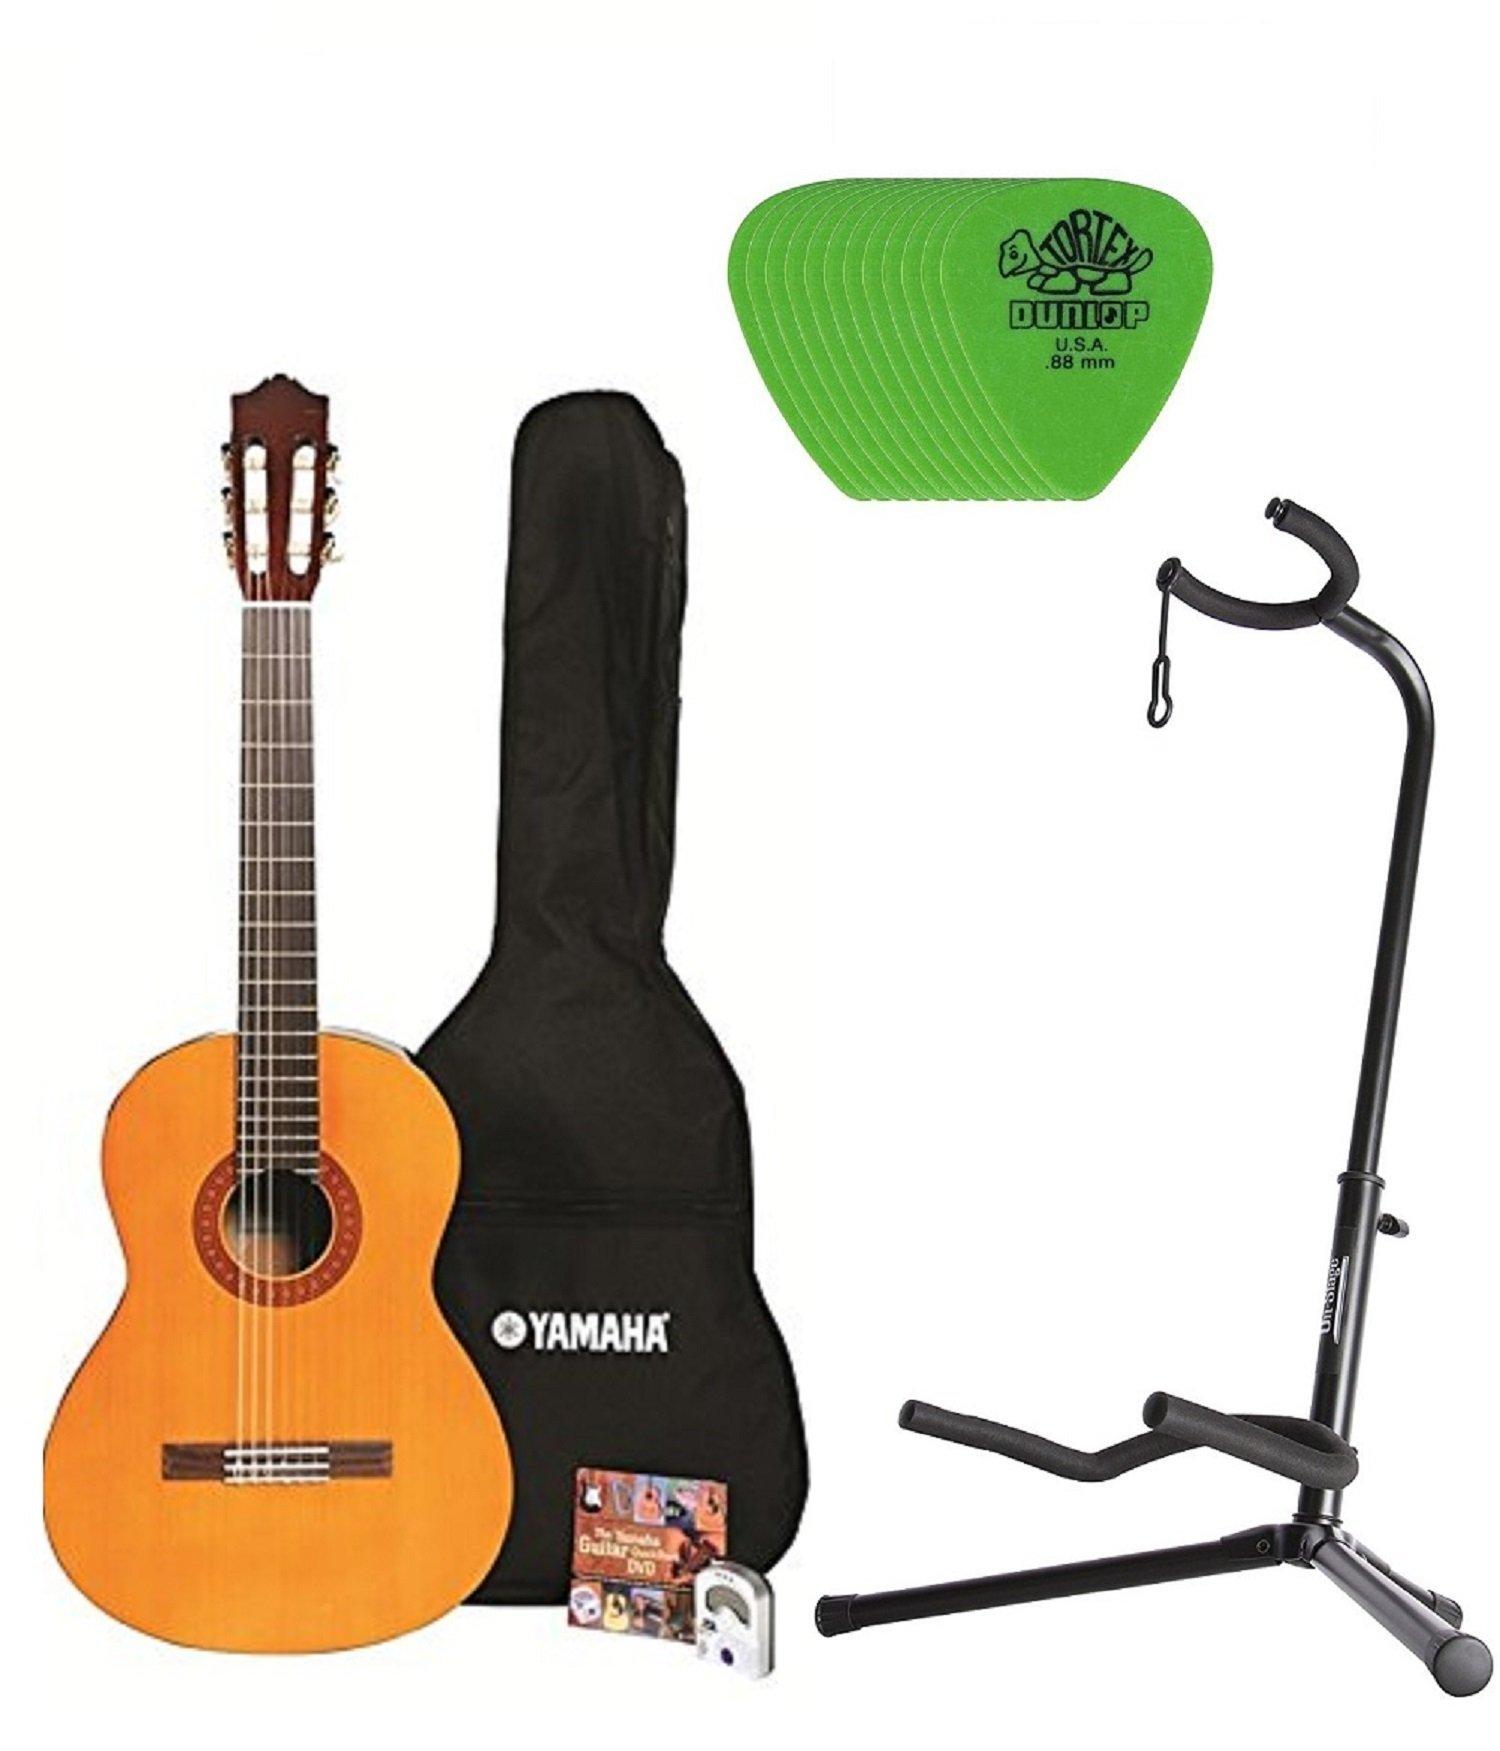 Yamaha C40 Nylon String Classic Guitar Bundle with Padded Bag, Digital Tuner, Stand ,Picks and Starter DVD by Yamaha